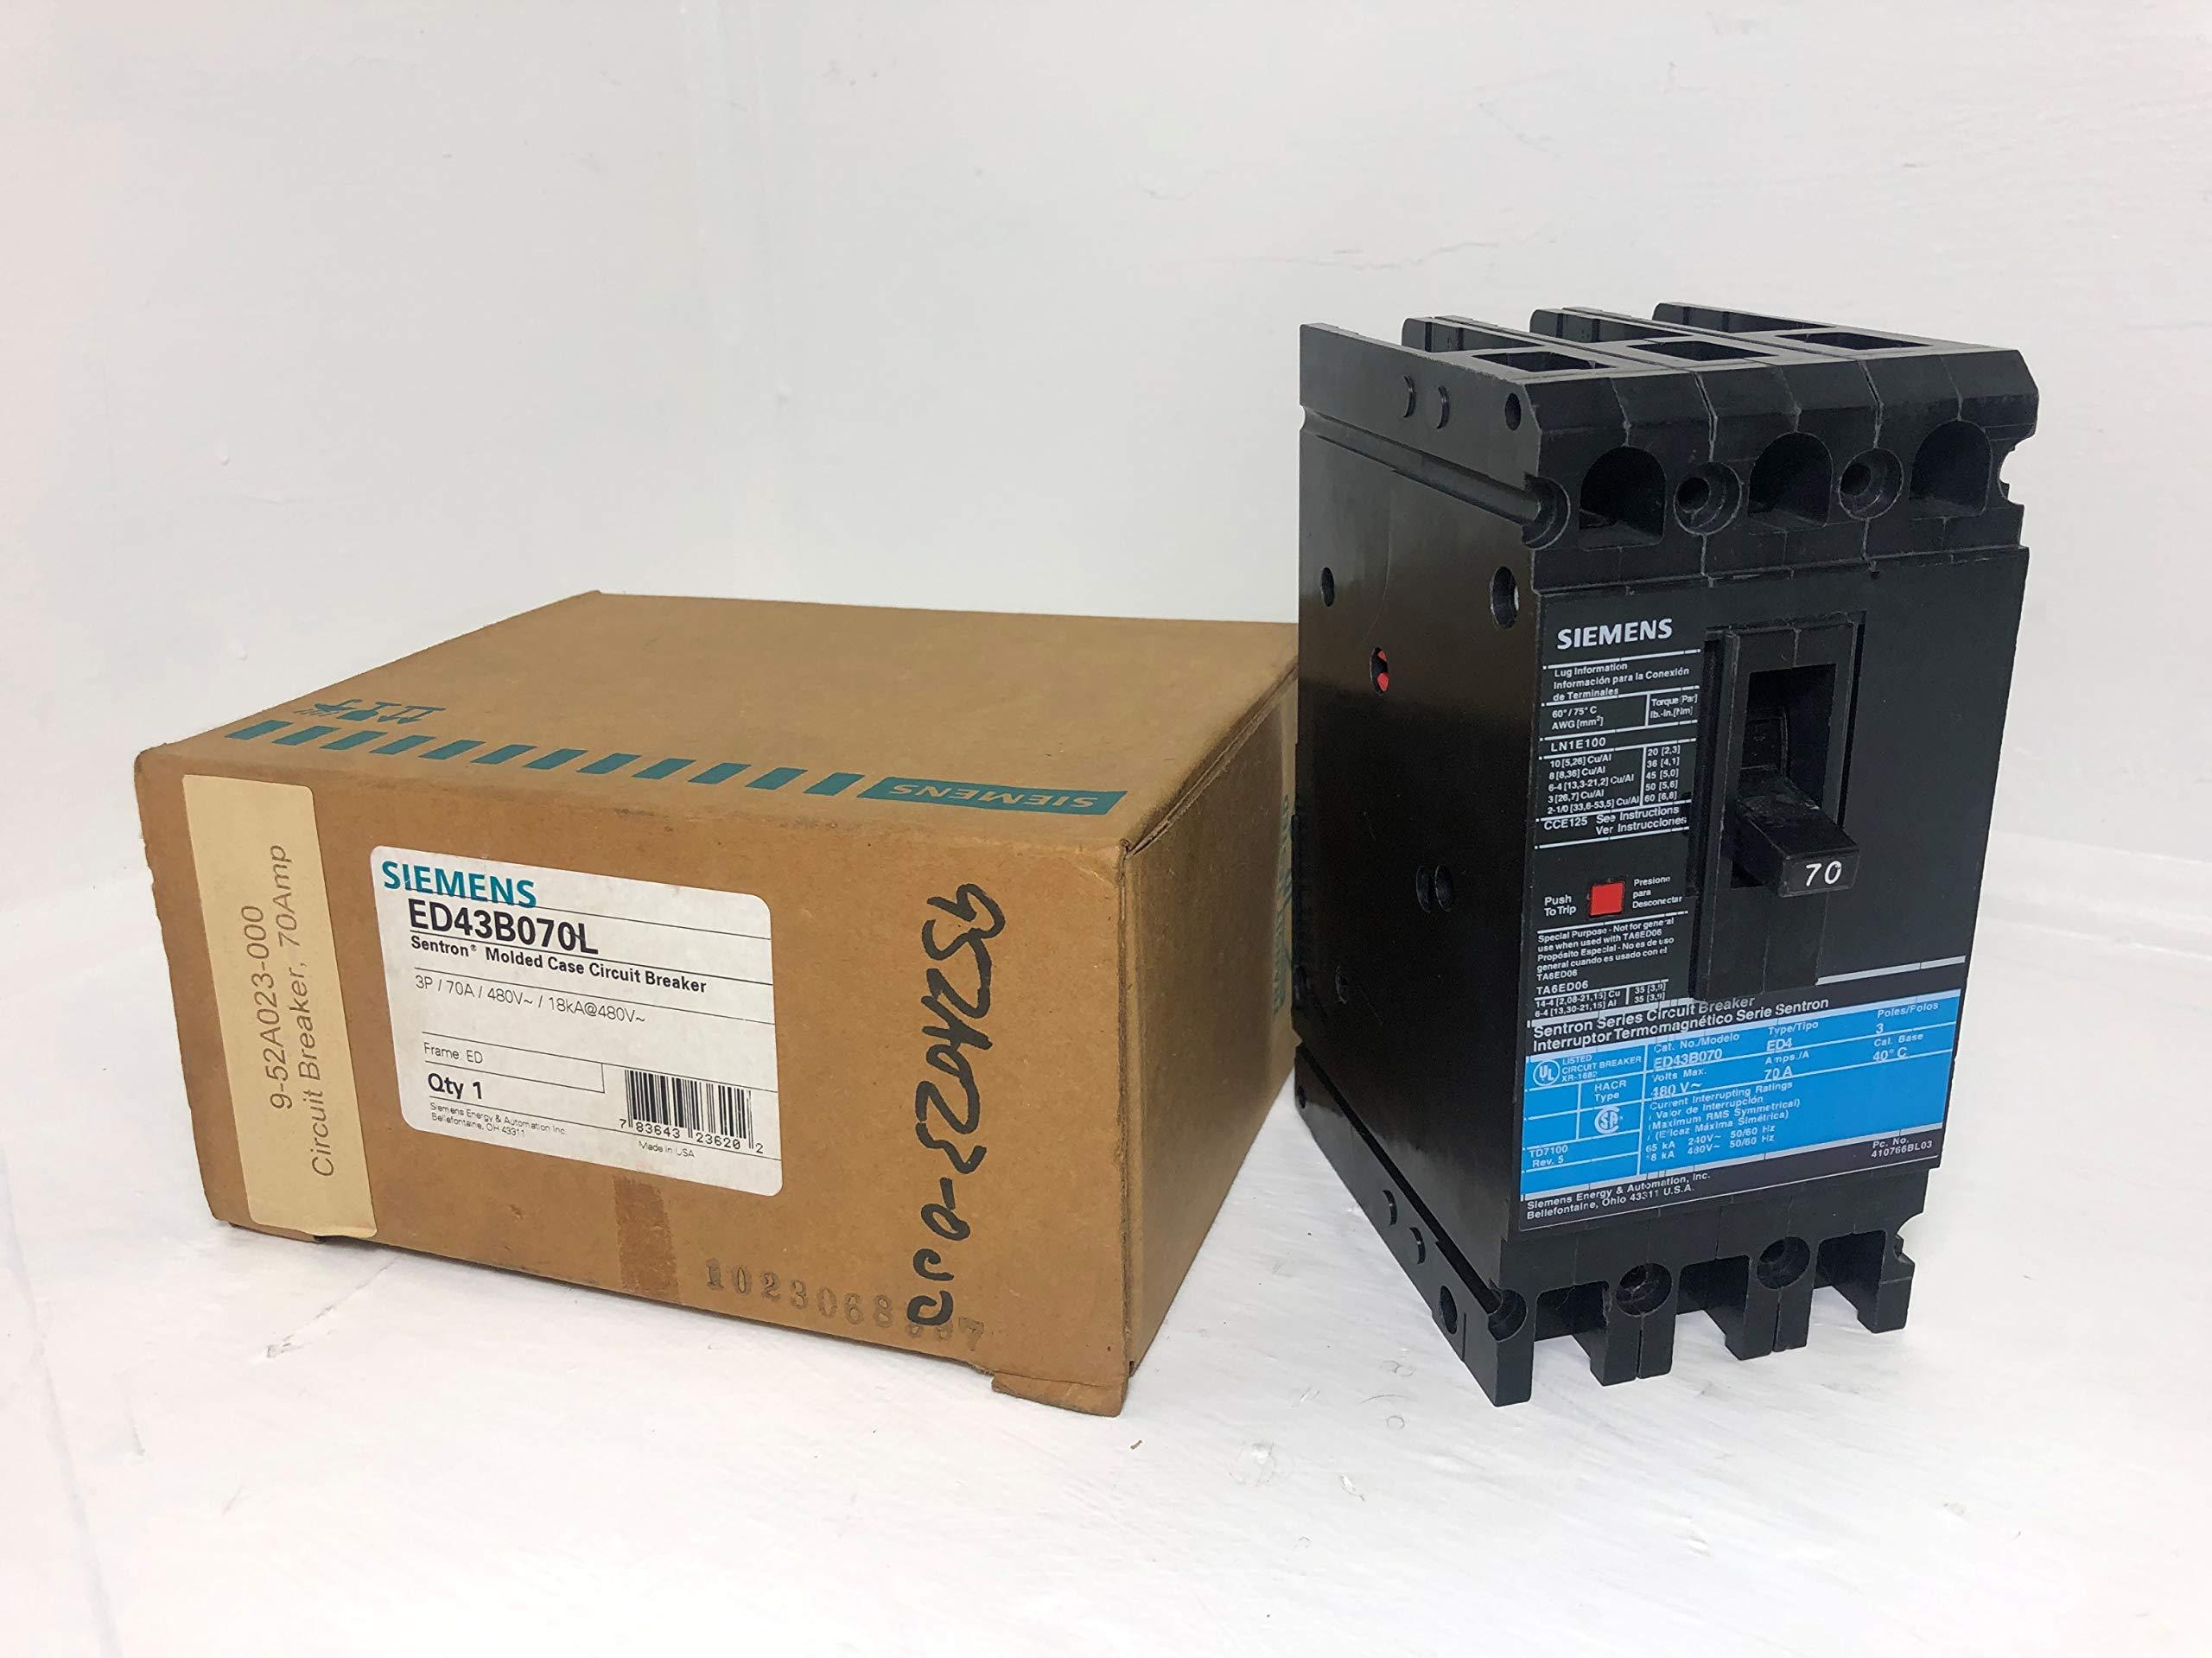 Siemens I-T-E ED43B070 70 Amp Circuit Breaker 480V Ground GF01ED60 ED4 ITE 70A by SIEMENS